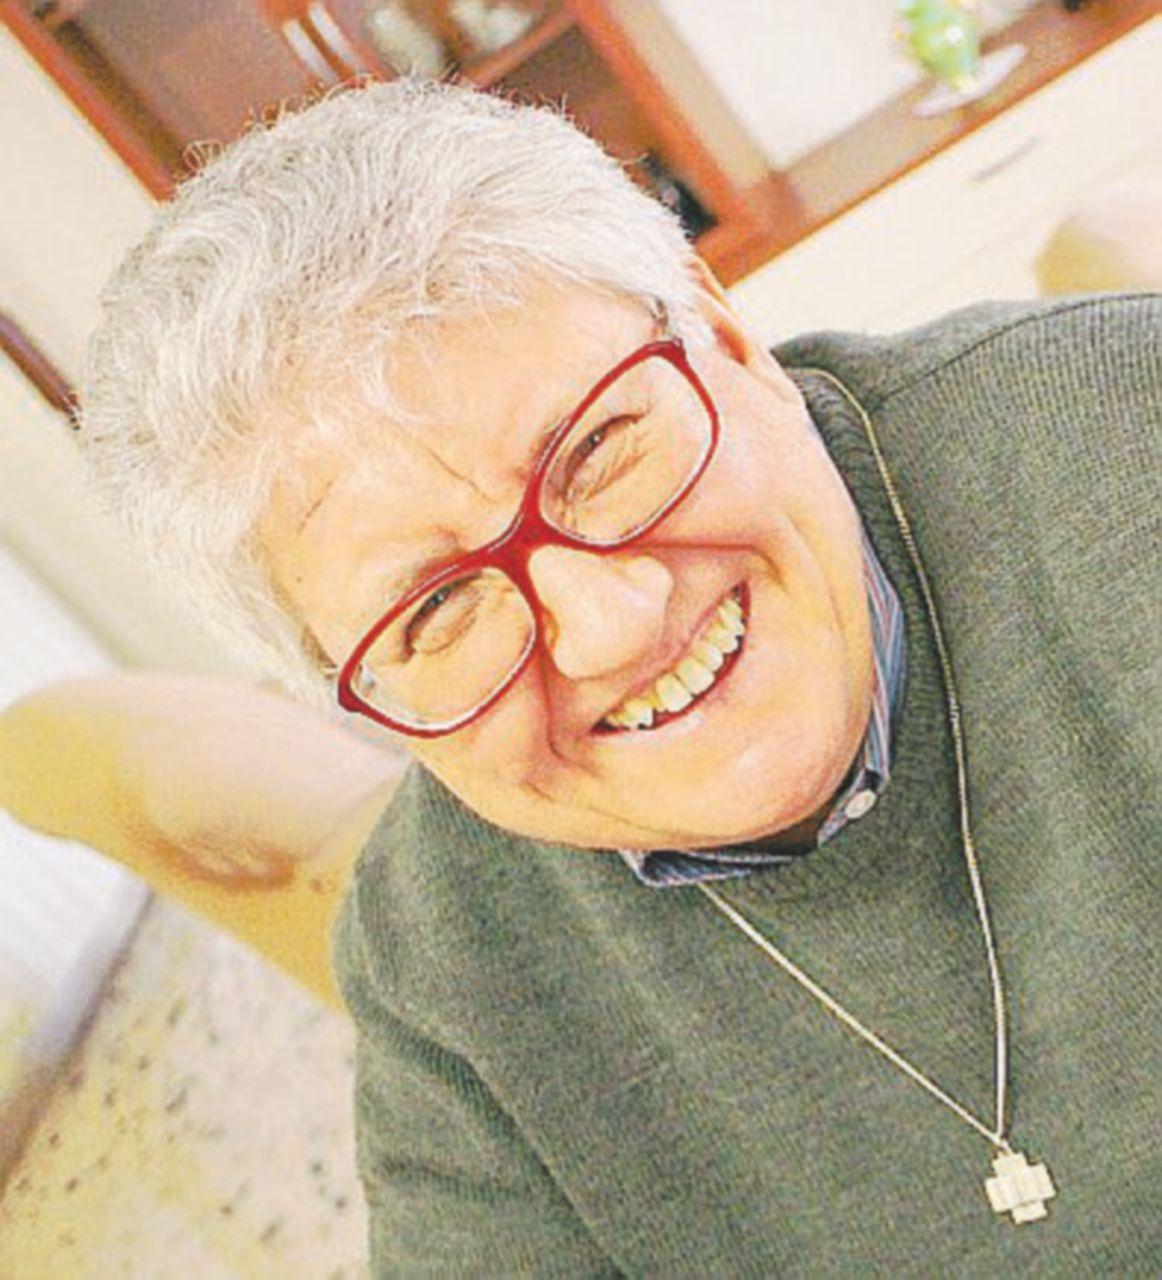 Imprenditrice, animatrice, giornalista. Fernanda resta sempre una suora